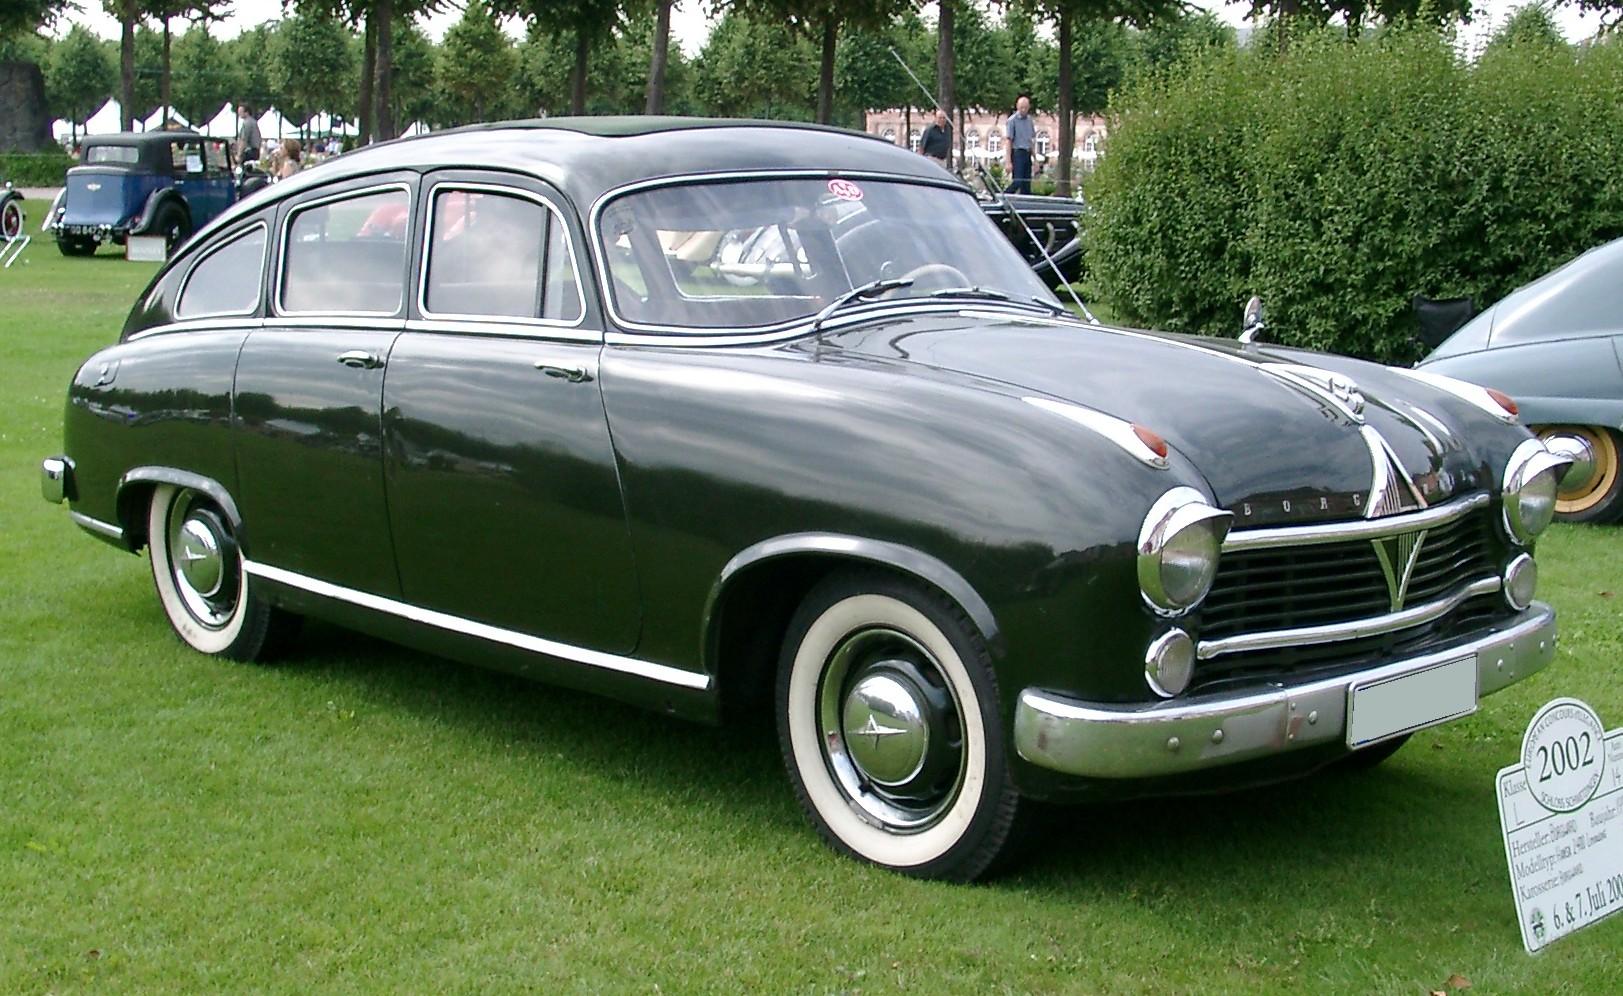 Limousine For Sale >> File:Borgward Hansa 2400 side 20020707.jpg - Wikimedia Commons